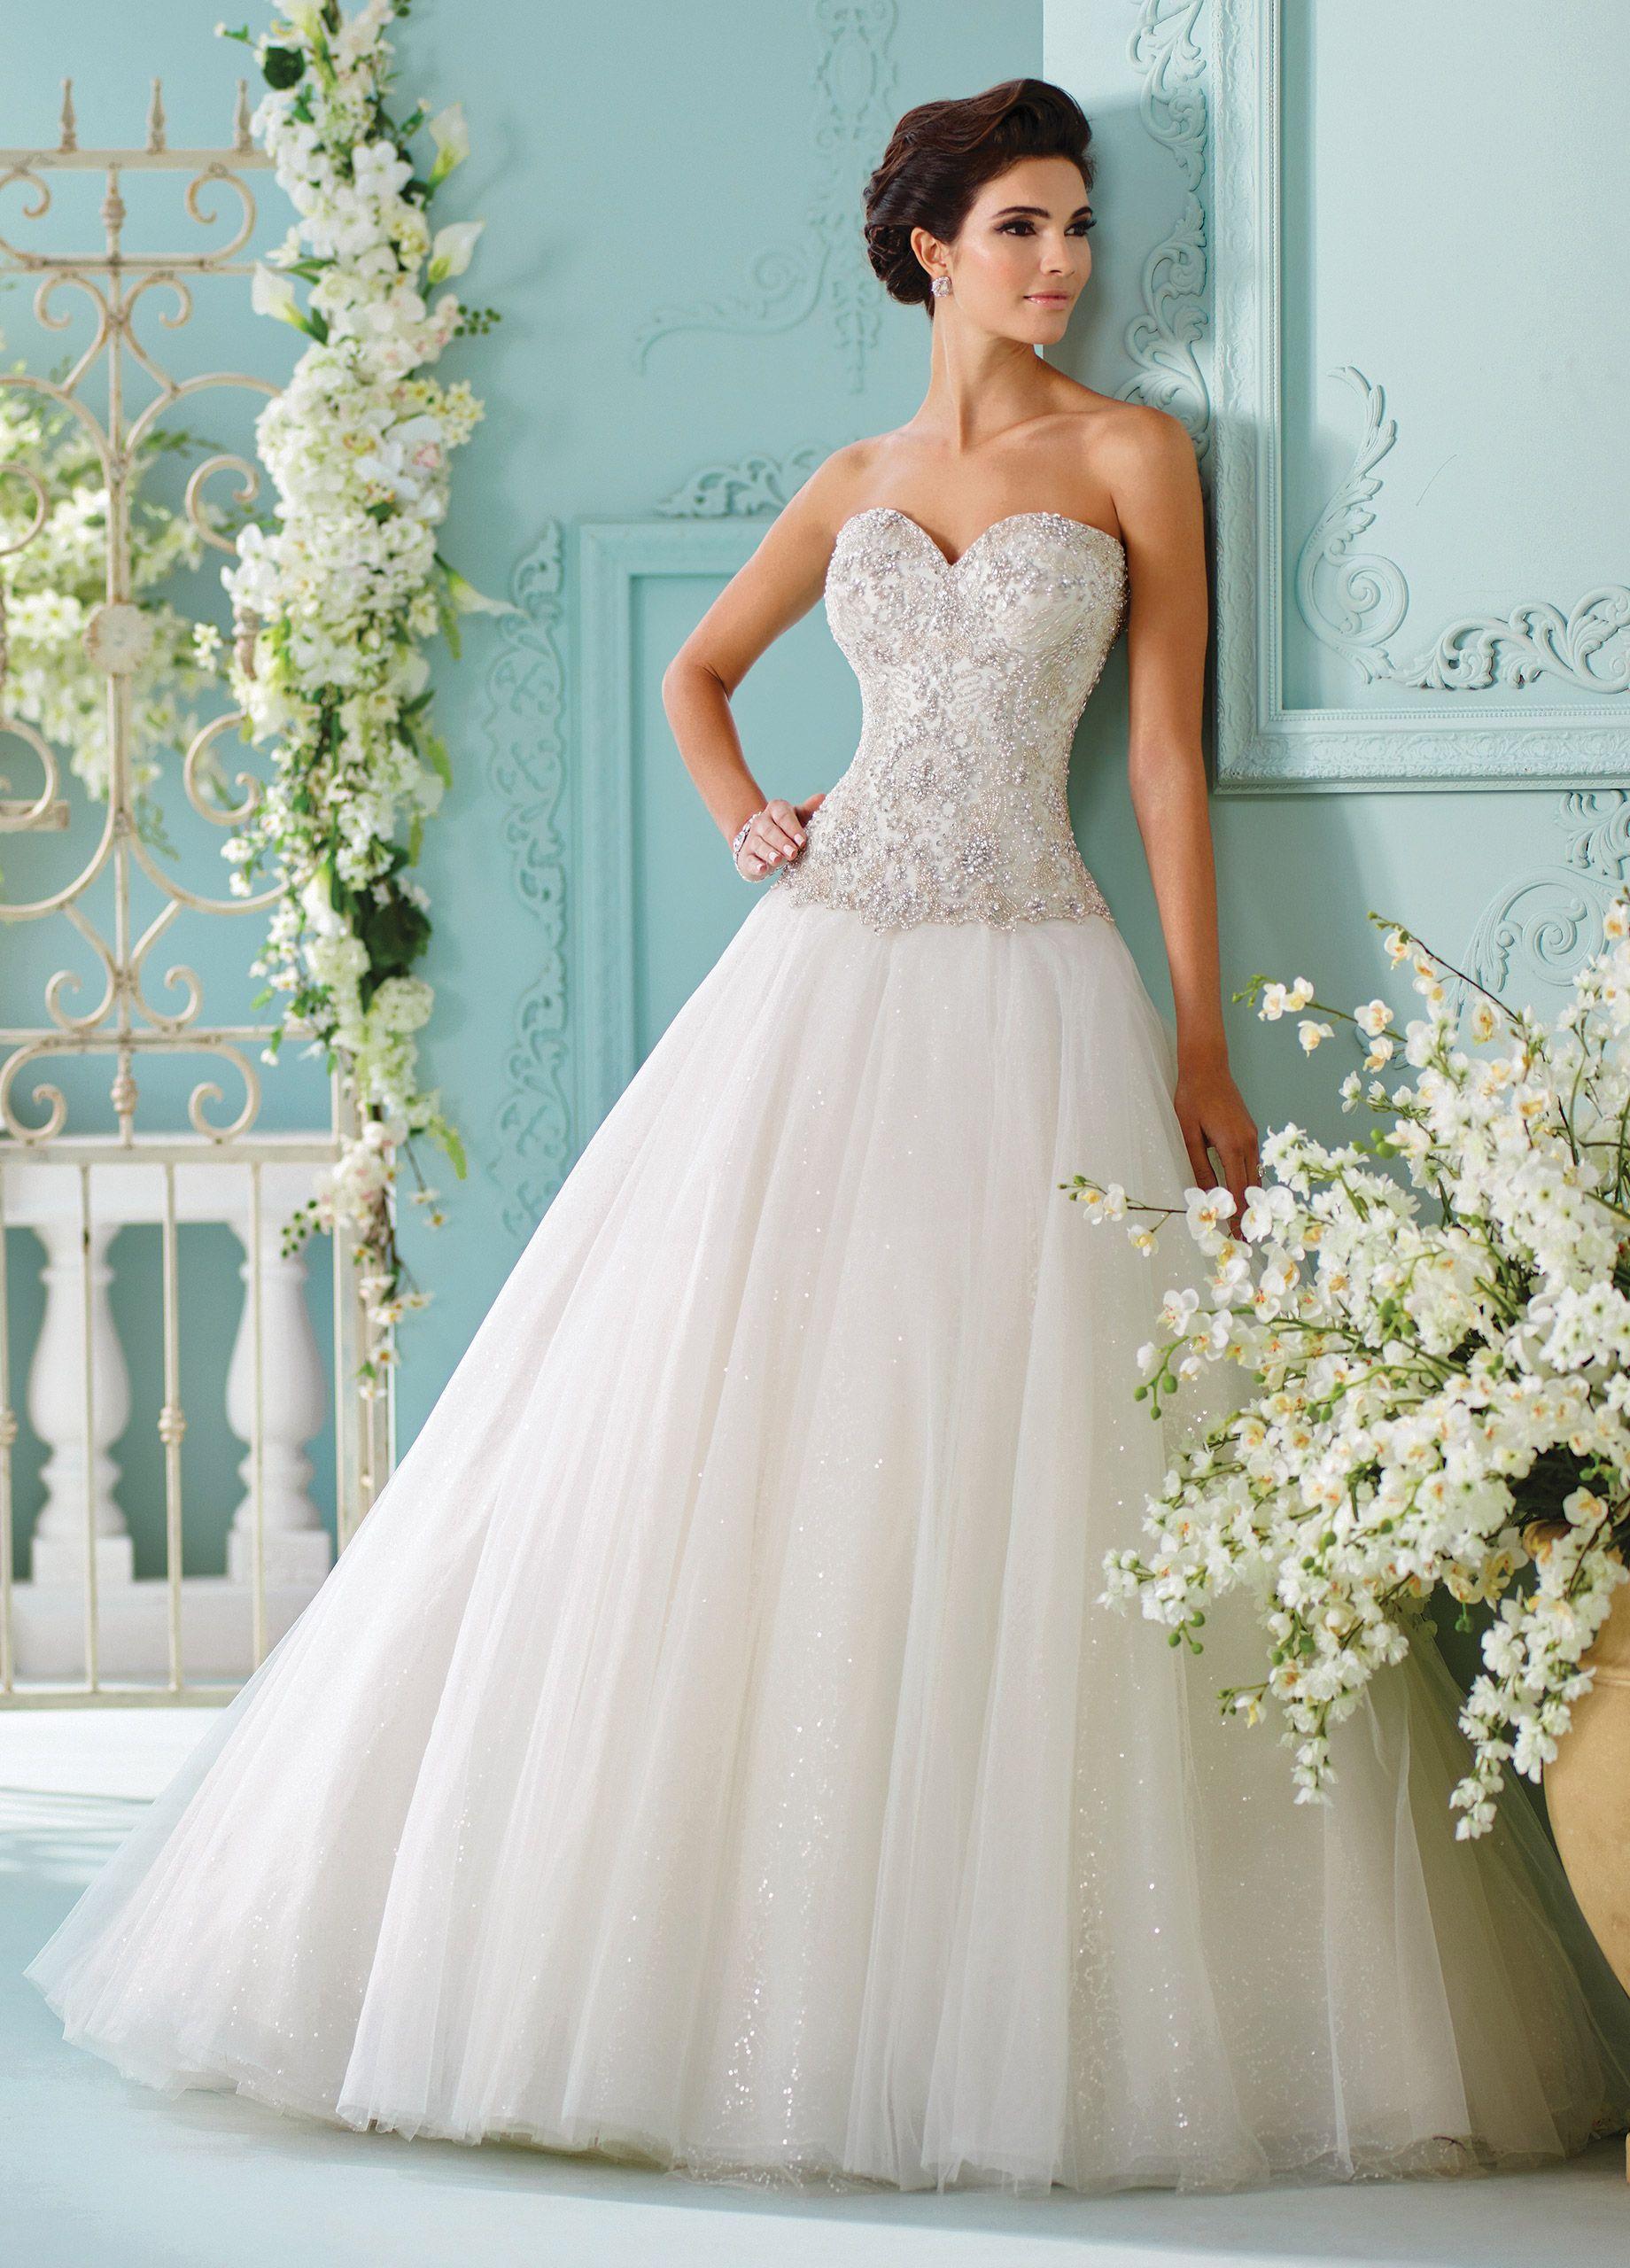 Colorful Wedding Dresses Belfast Festooning - All Wedding Dresses ...